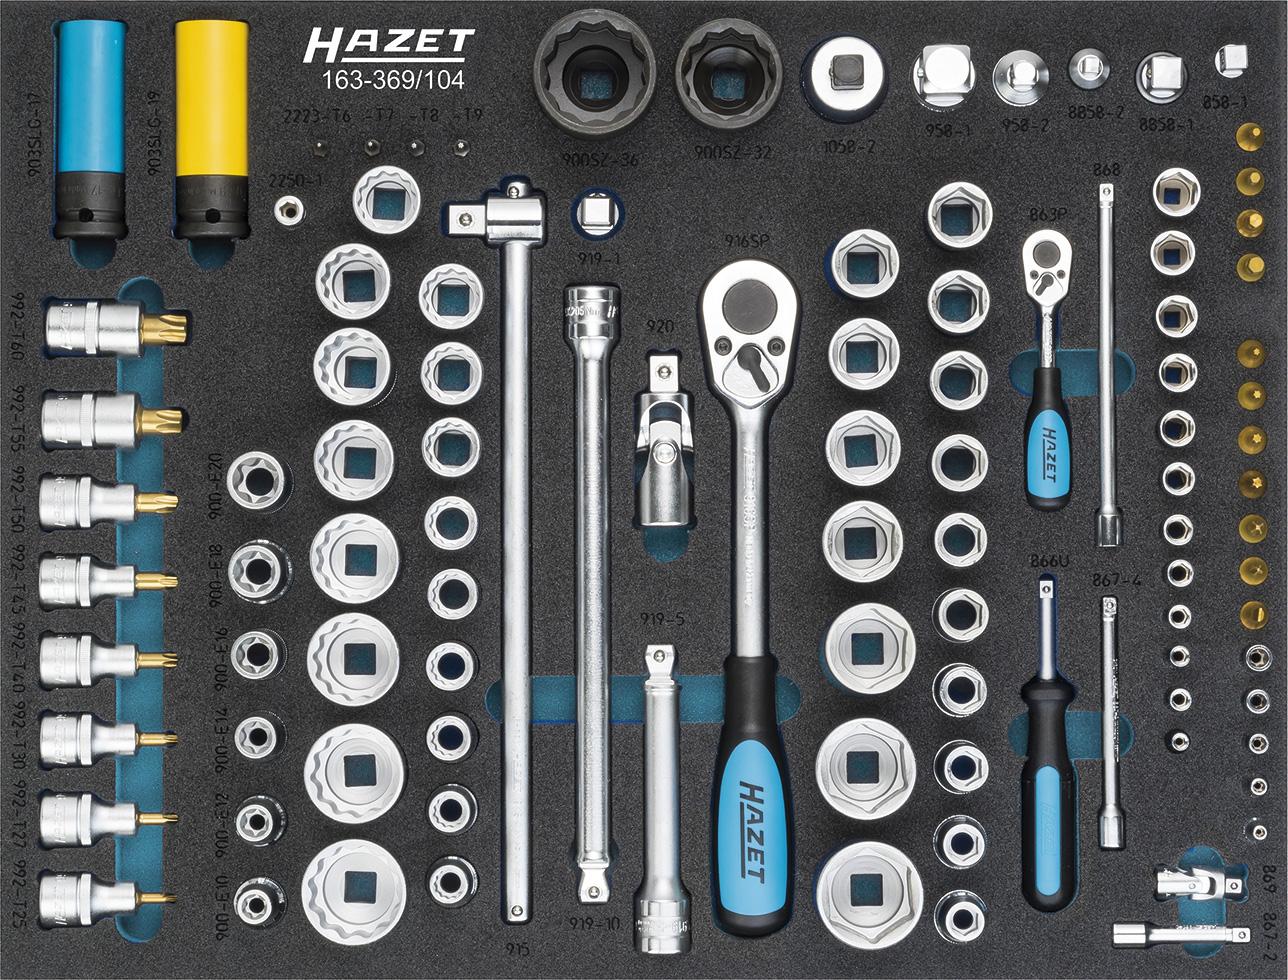 Hazet Steckschlüssel-Satz 163-369/104 | Dittmar - Werkzeuge